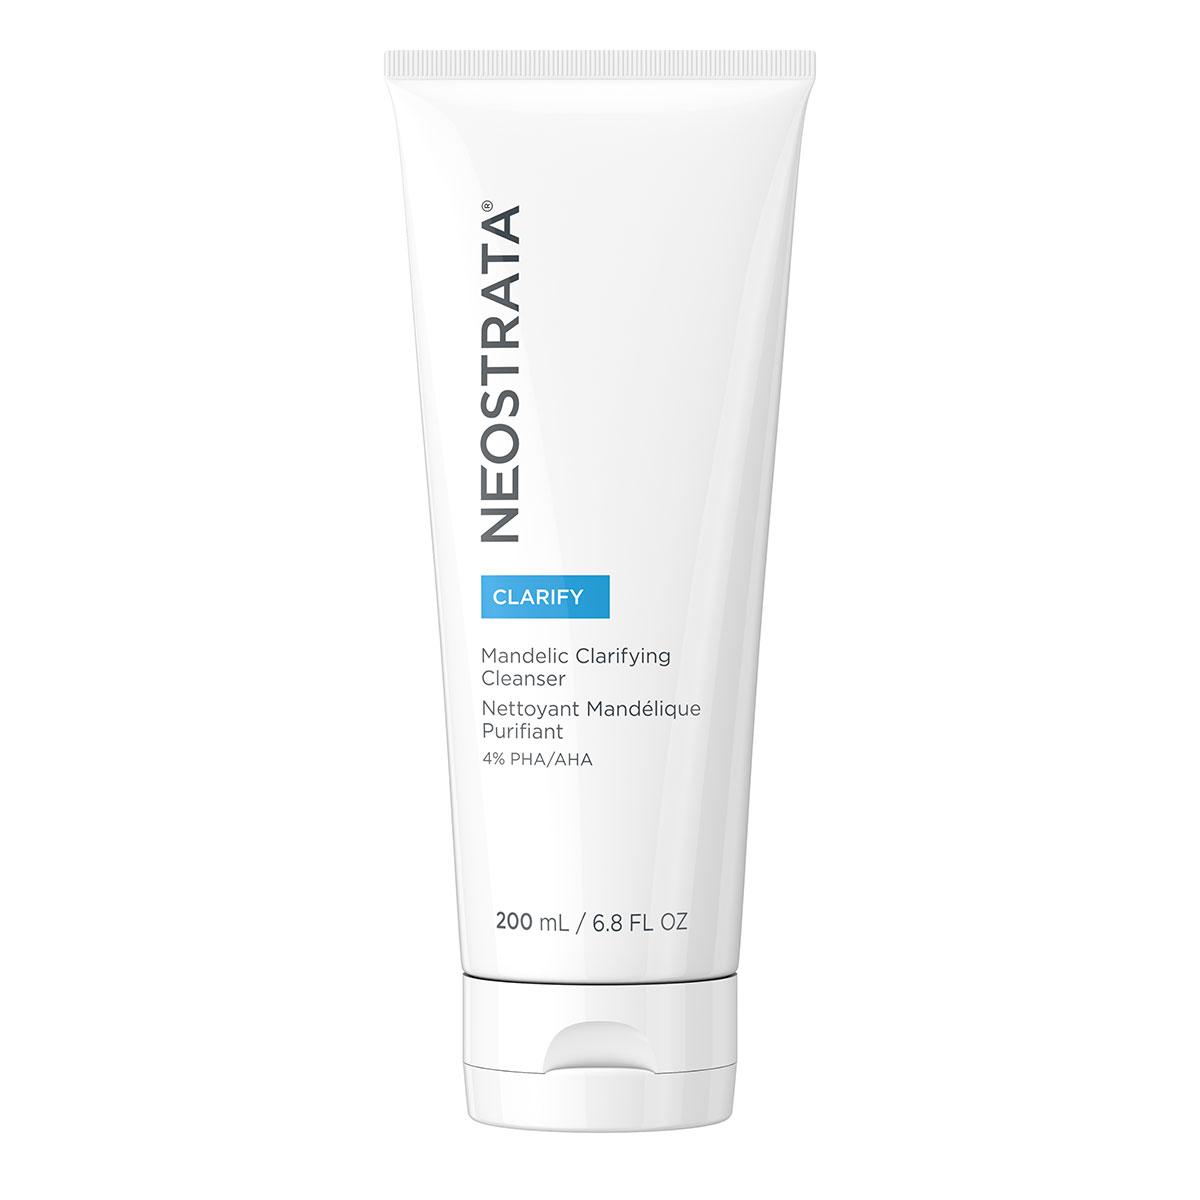 Neostrata Clarify Mandelic Clarifying Cleanser 200 ml